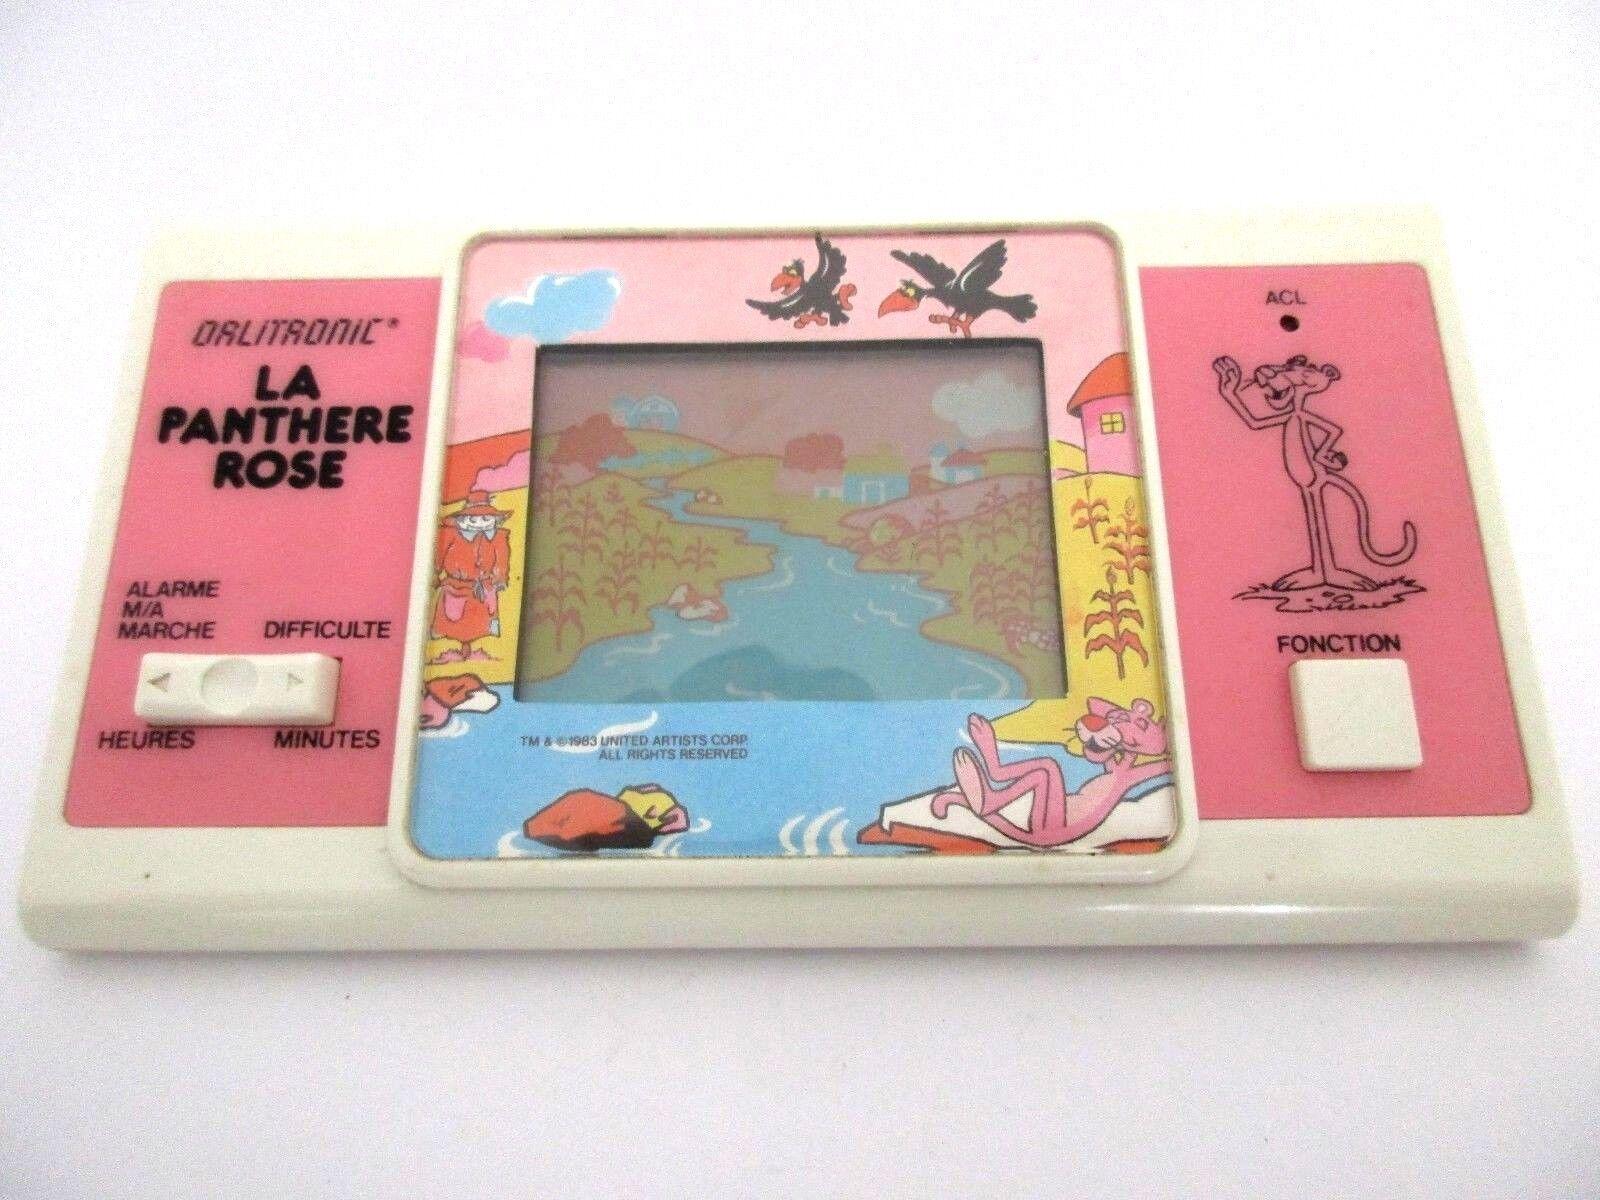 Juego Orlitronic la pantera rosadodo rosadododo ancha pantalla LCD Game-tiger 1984